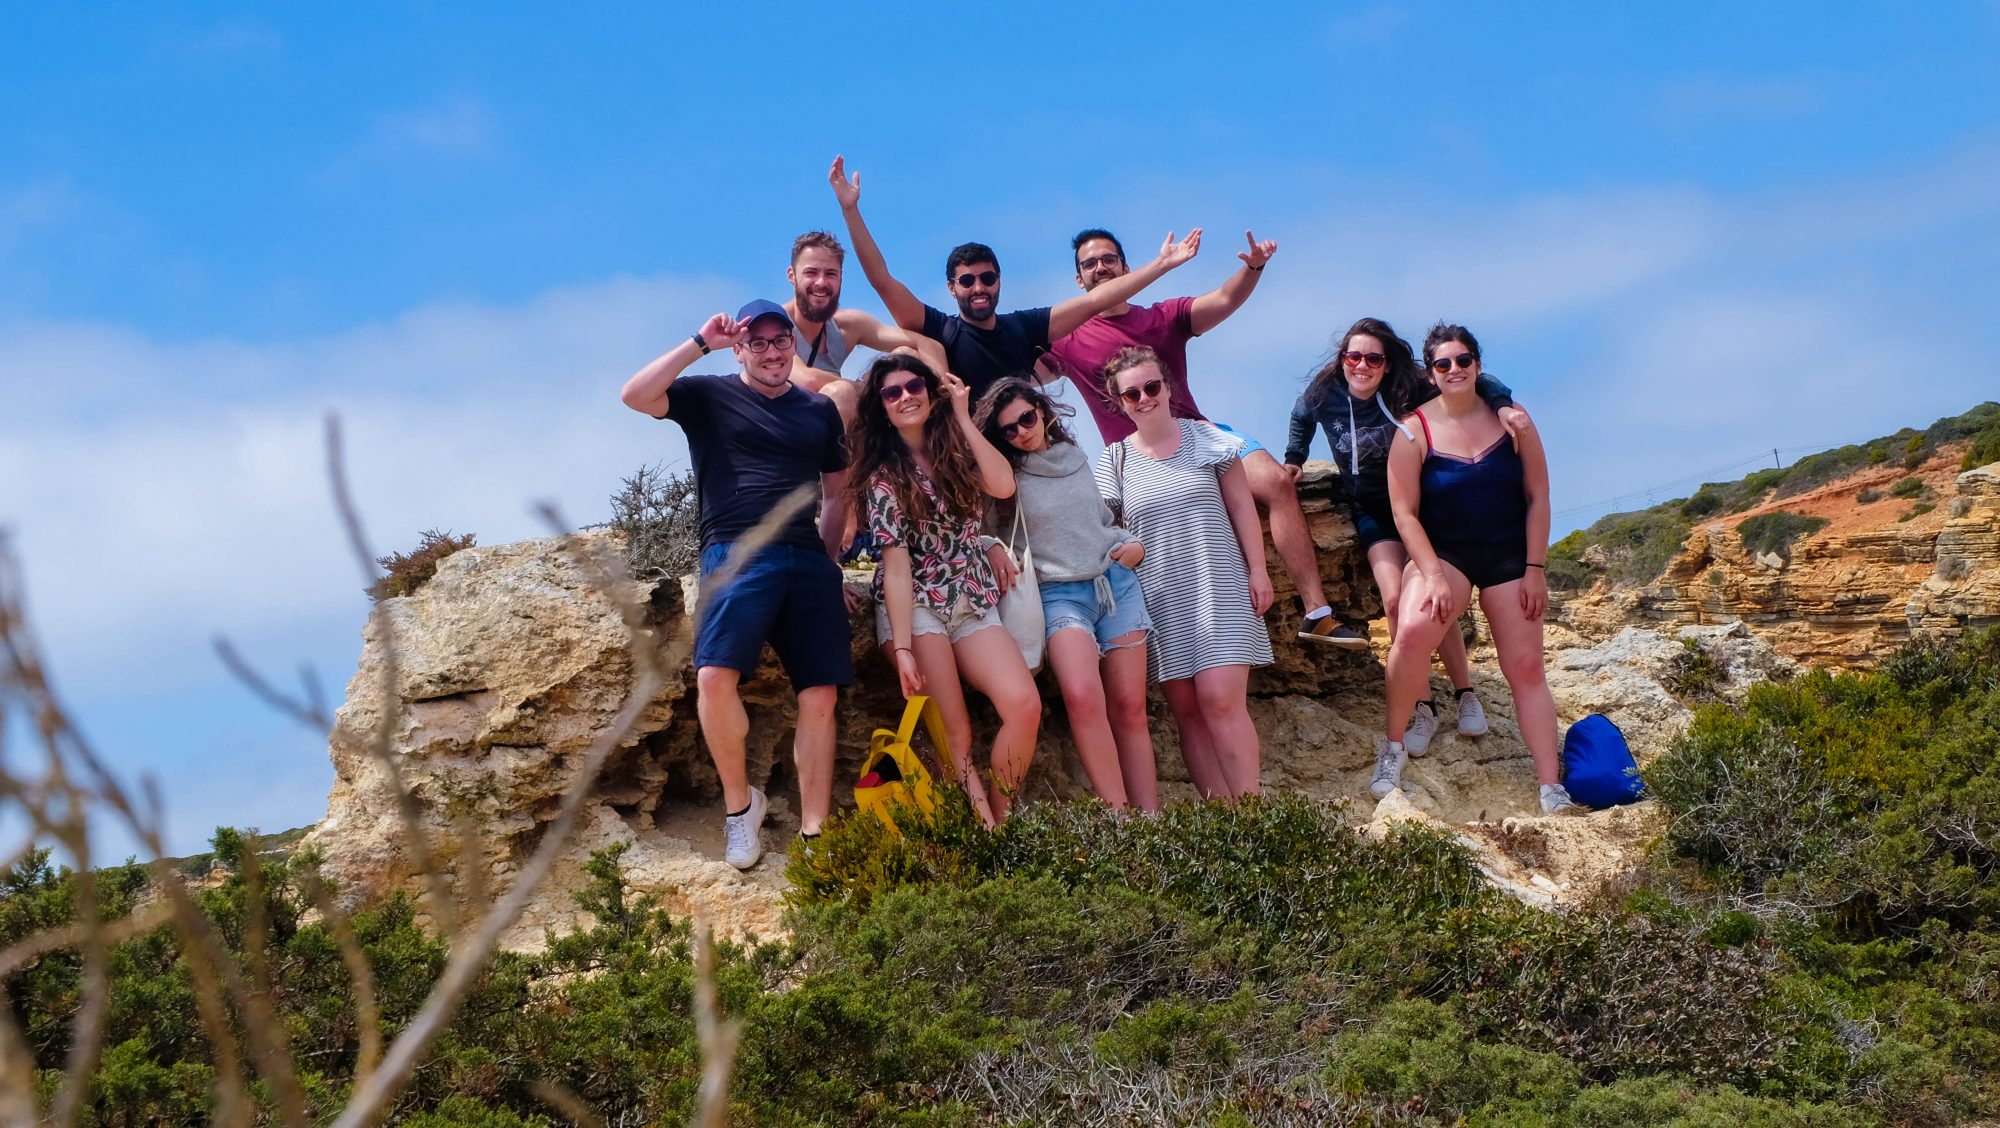 Les amis - Sagres, Portugal